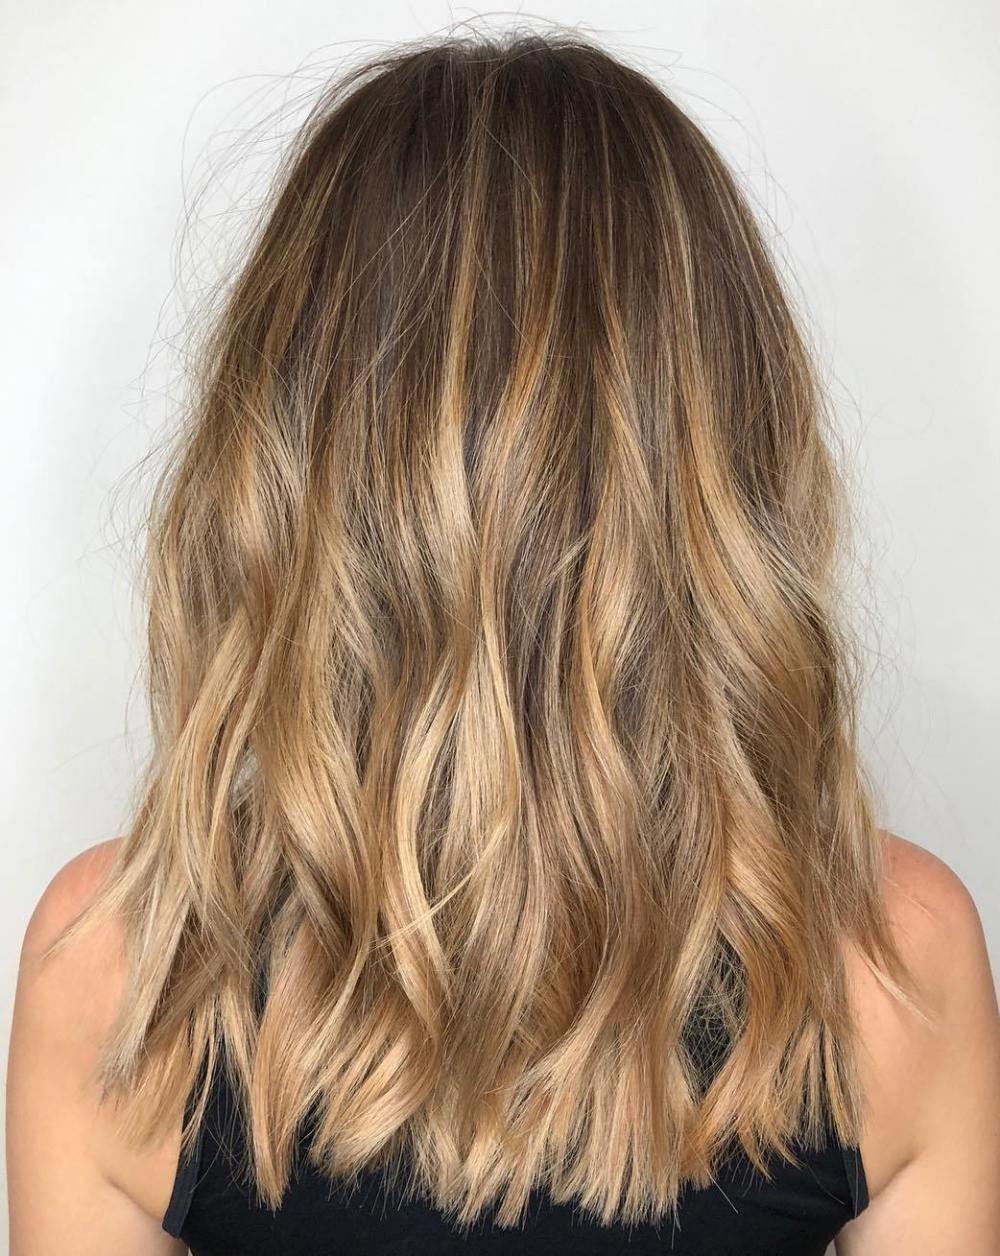 14 Honey Blonde Balayage On Light Brown Hair 20 Honey